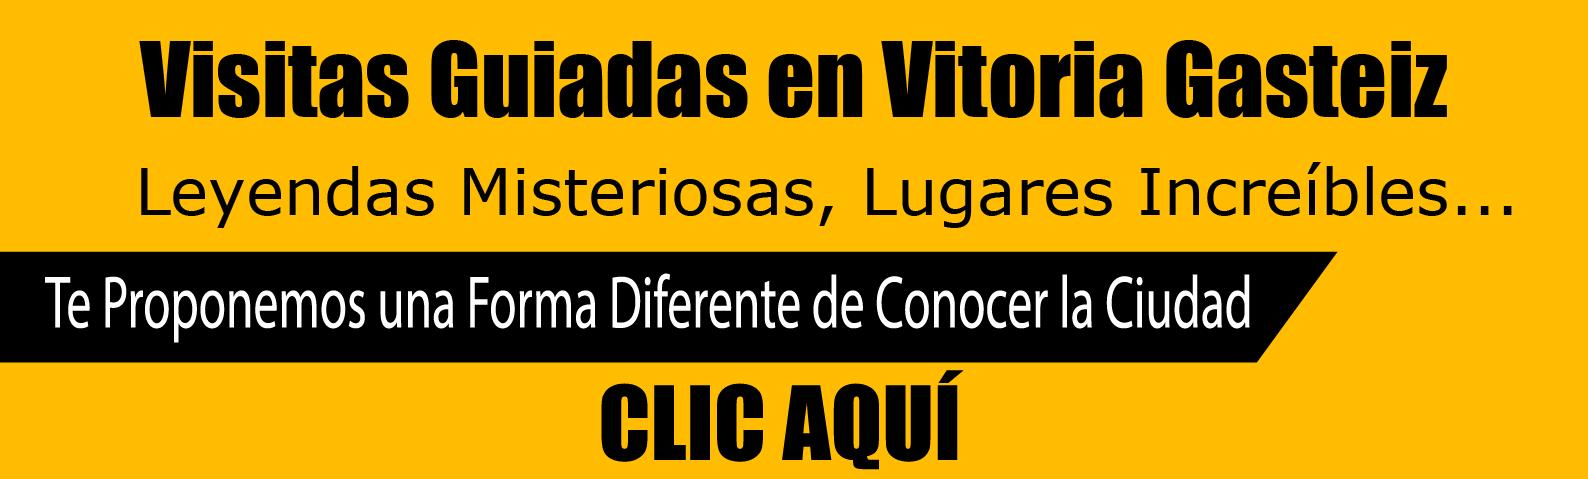 Visitas Guiadas en Vitoria Gasteiz